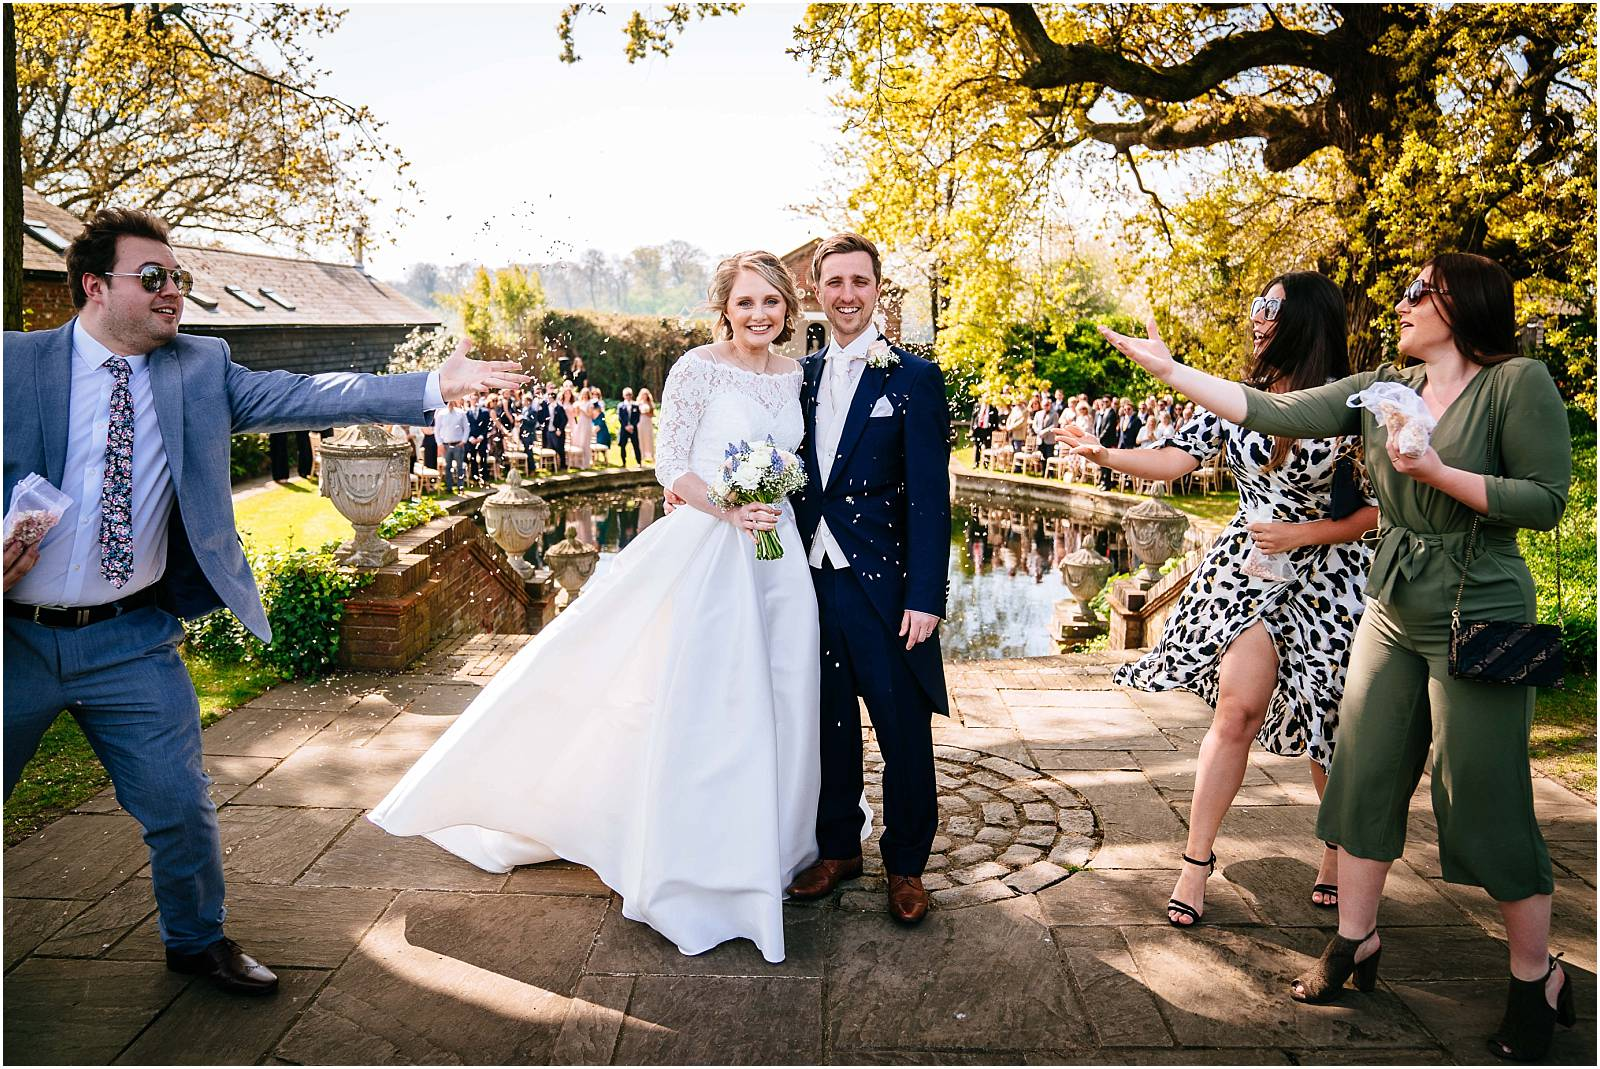 nicola anne wedding dress